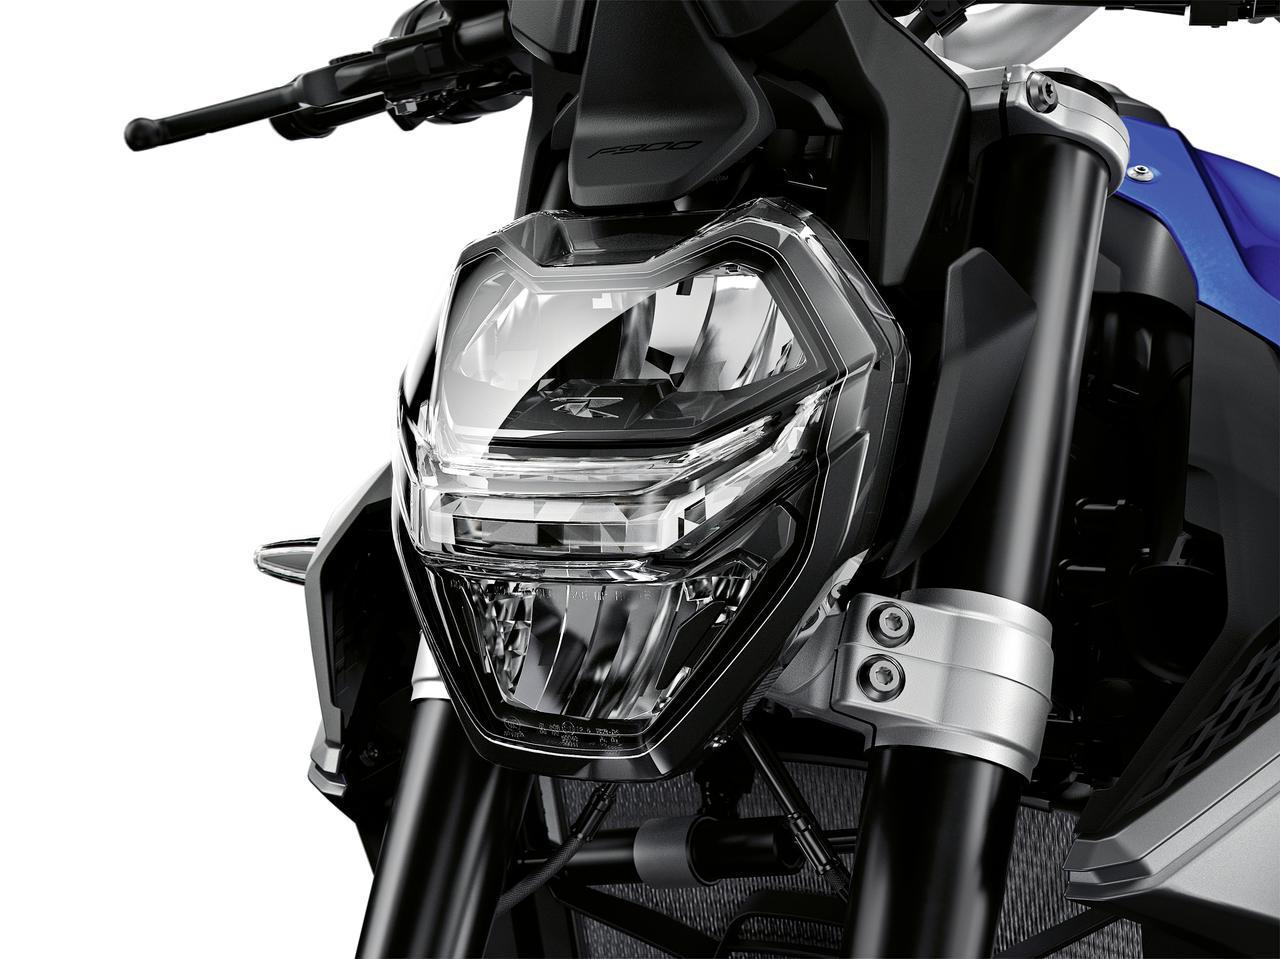 Images : 5番目の画像 - F900Rの写真を全て見る - webオートバイ